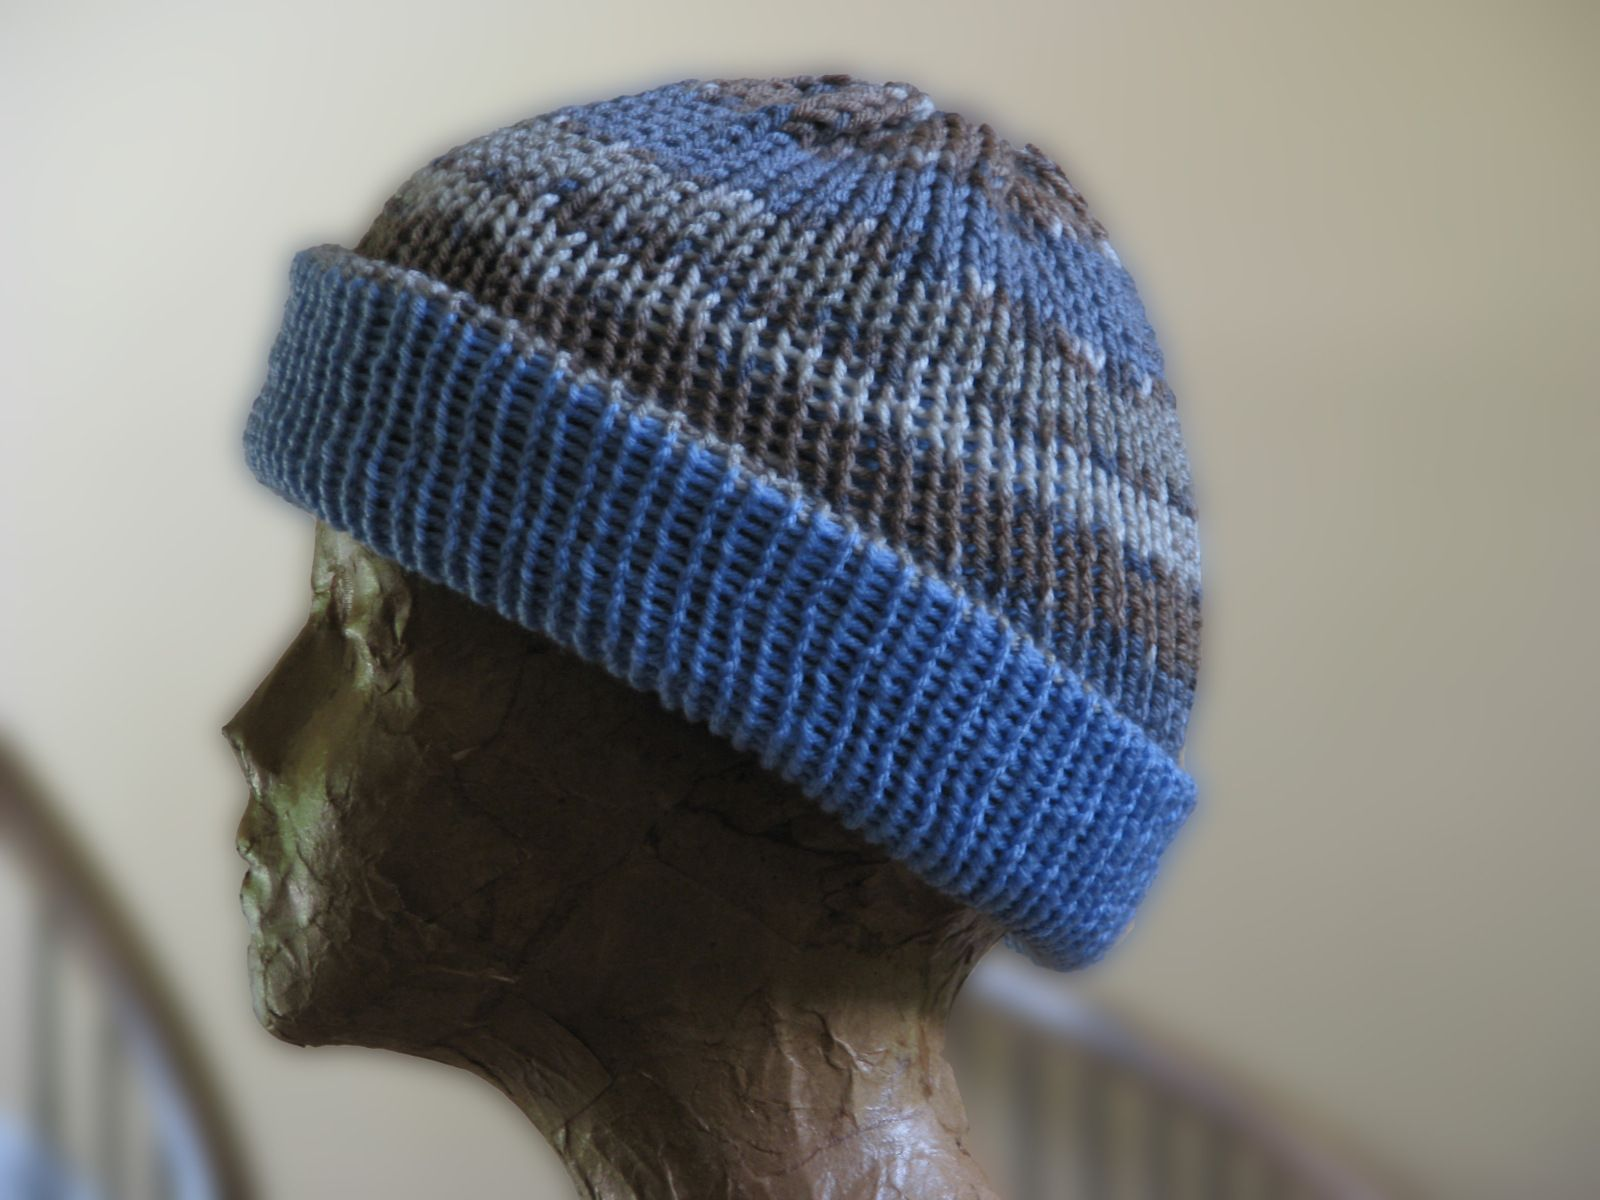 Reversible Hat Instructions: Crochet, Knit, Loom Knit or Addi ...